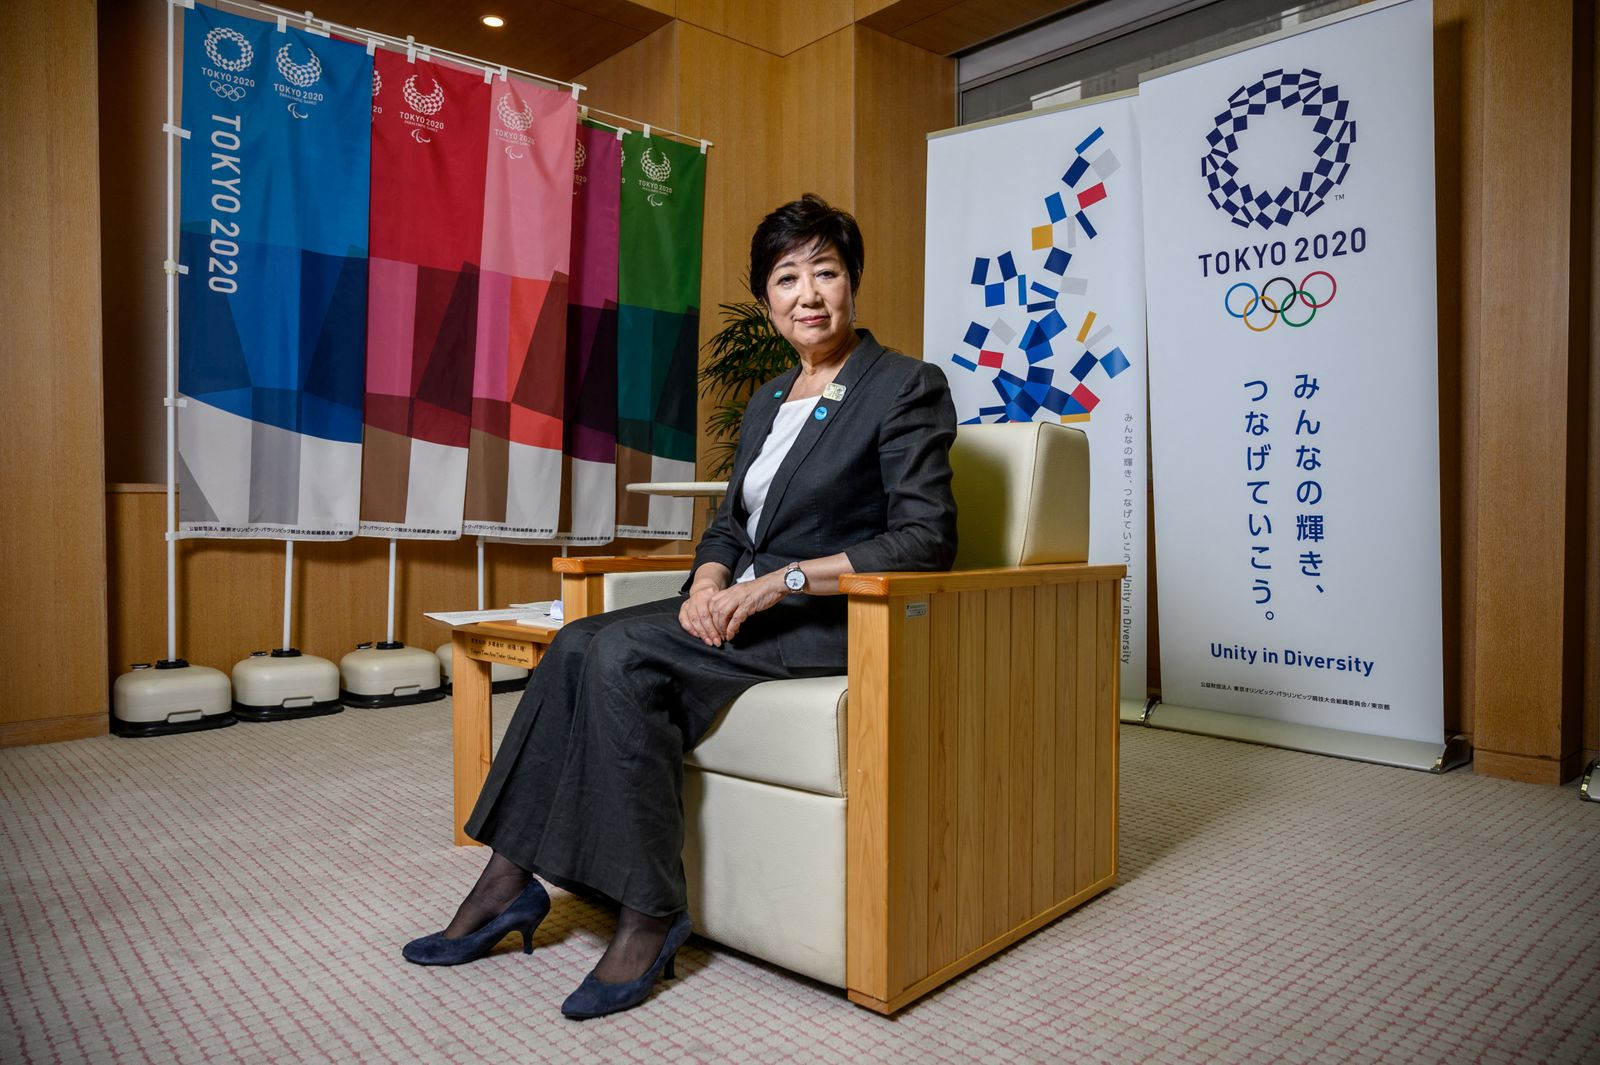 JAPAN-HEALTH-VIRUS-POLITICS-KOIKE-OLY-2020-2021-TOKYO